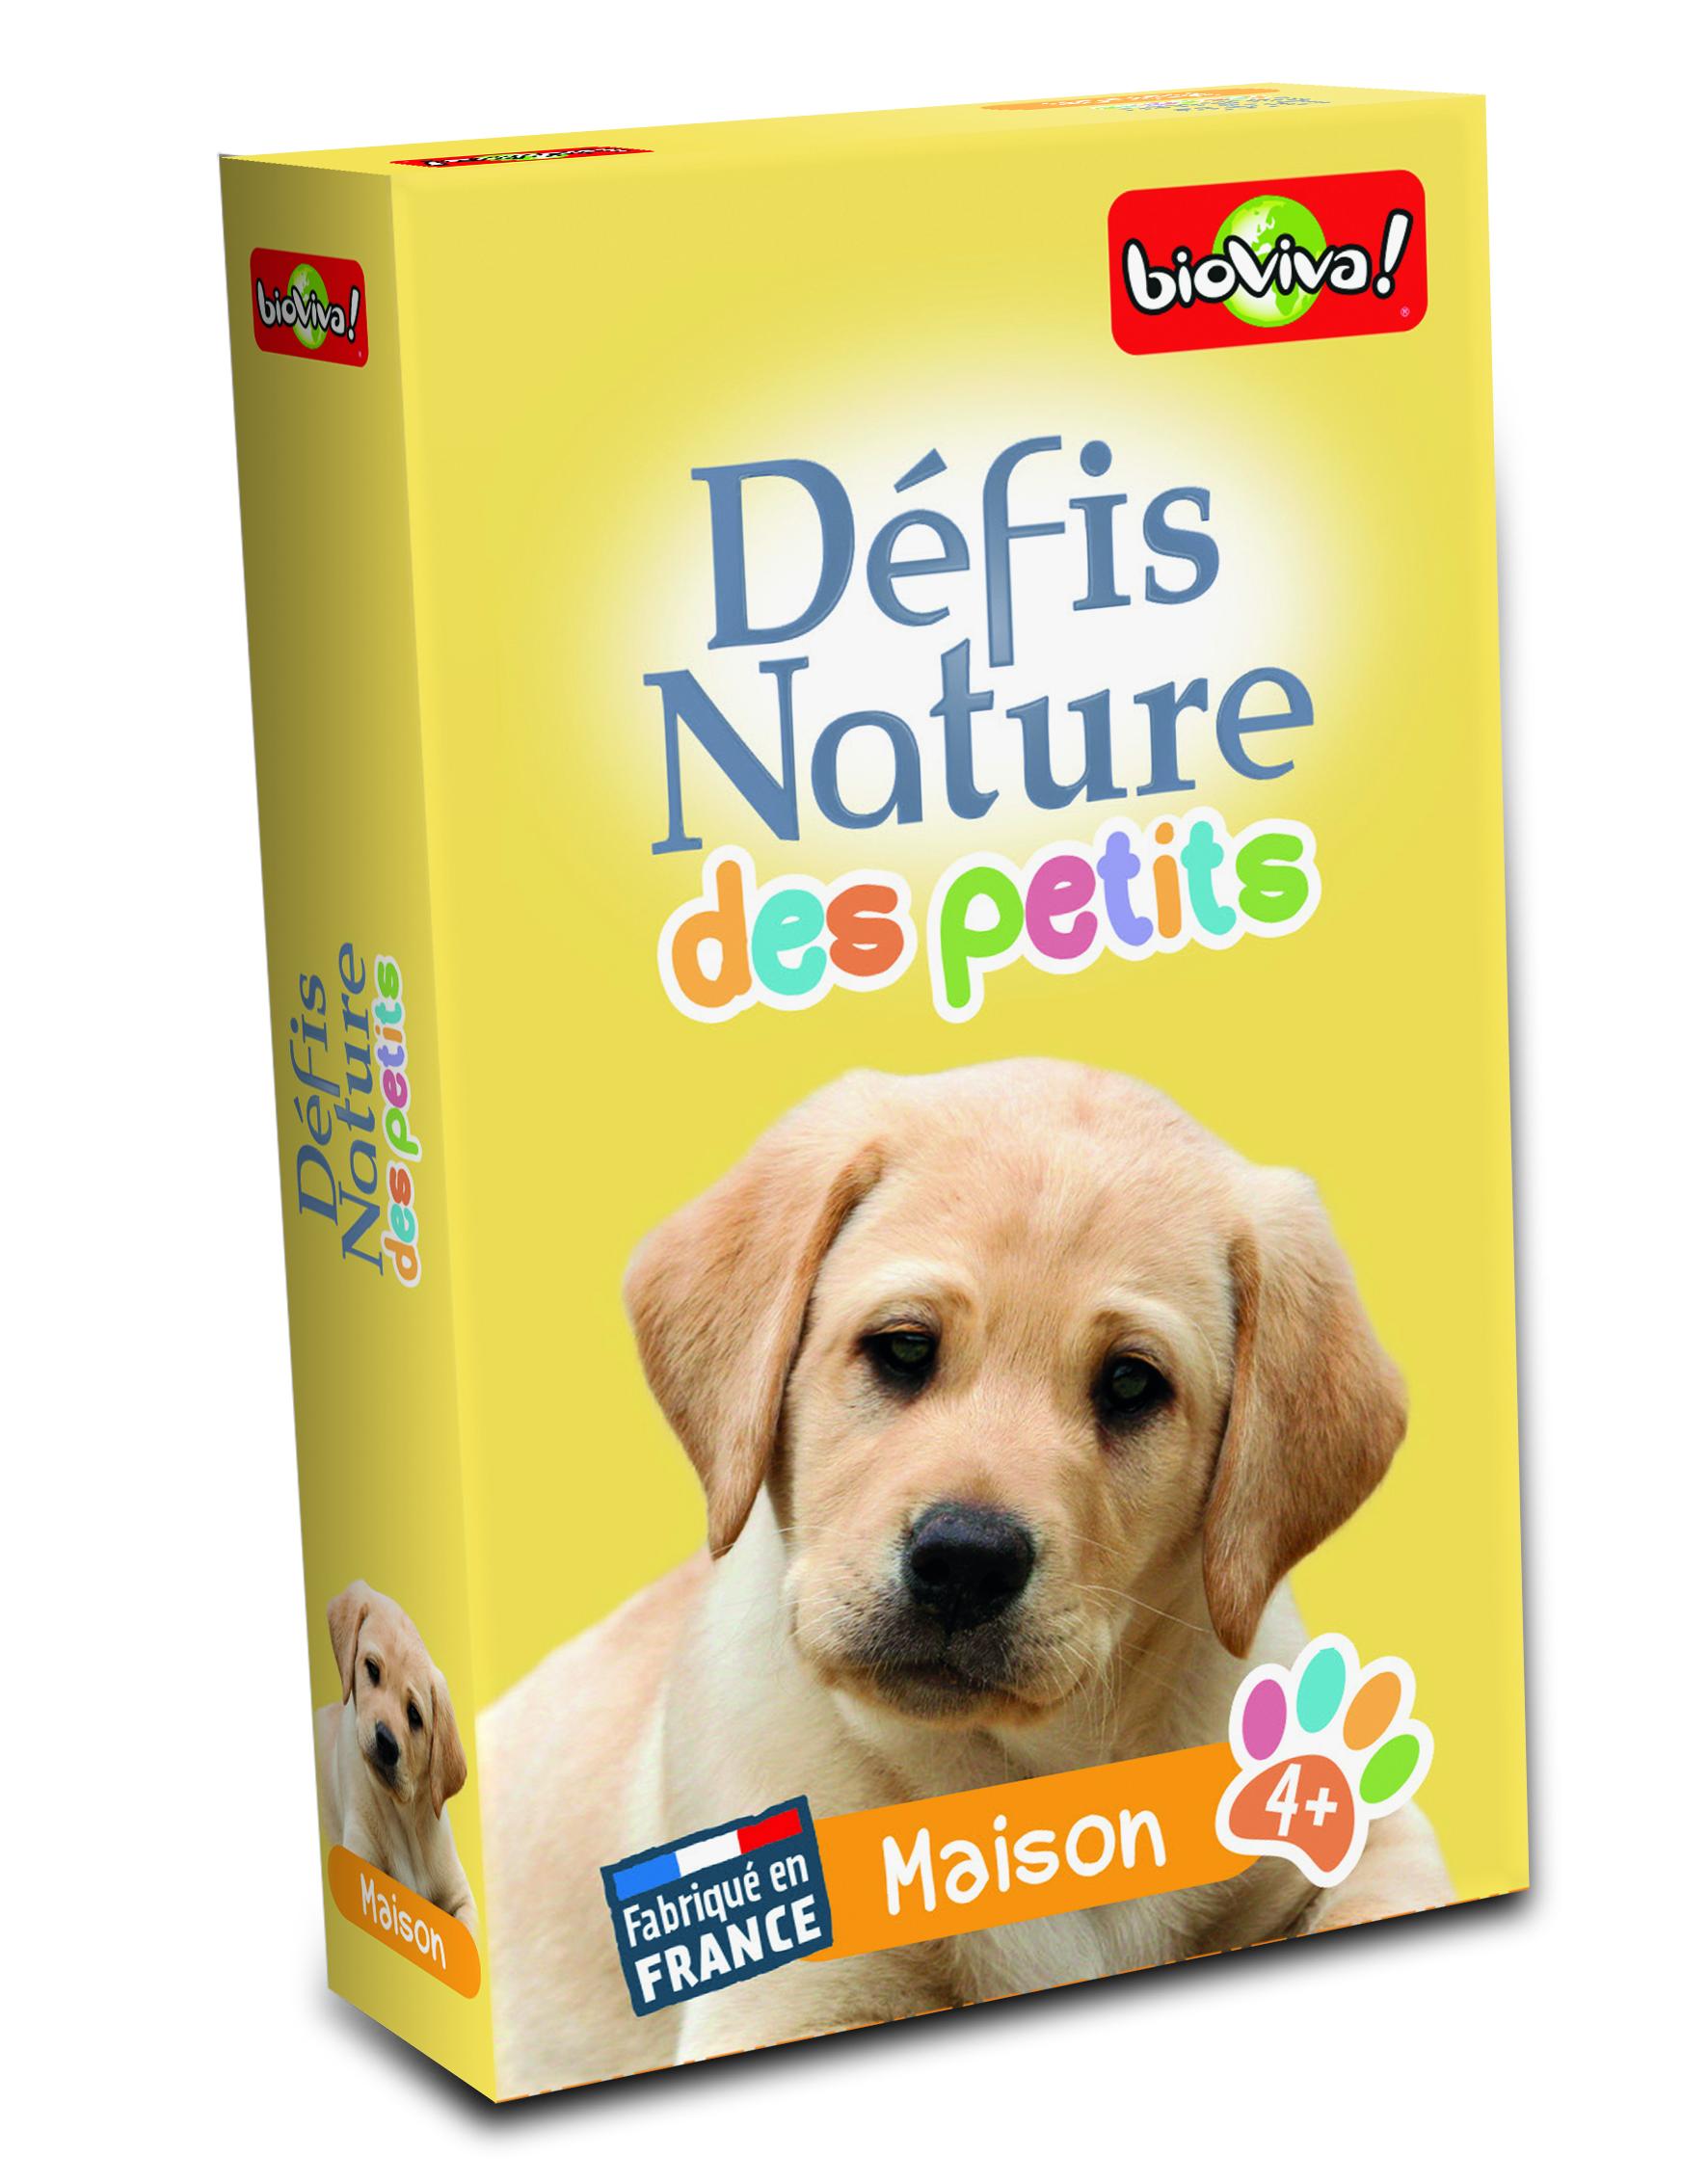 Defis Nature des Petits-Maison-Bioviva-Couv-Jeu de societe-ludovox